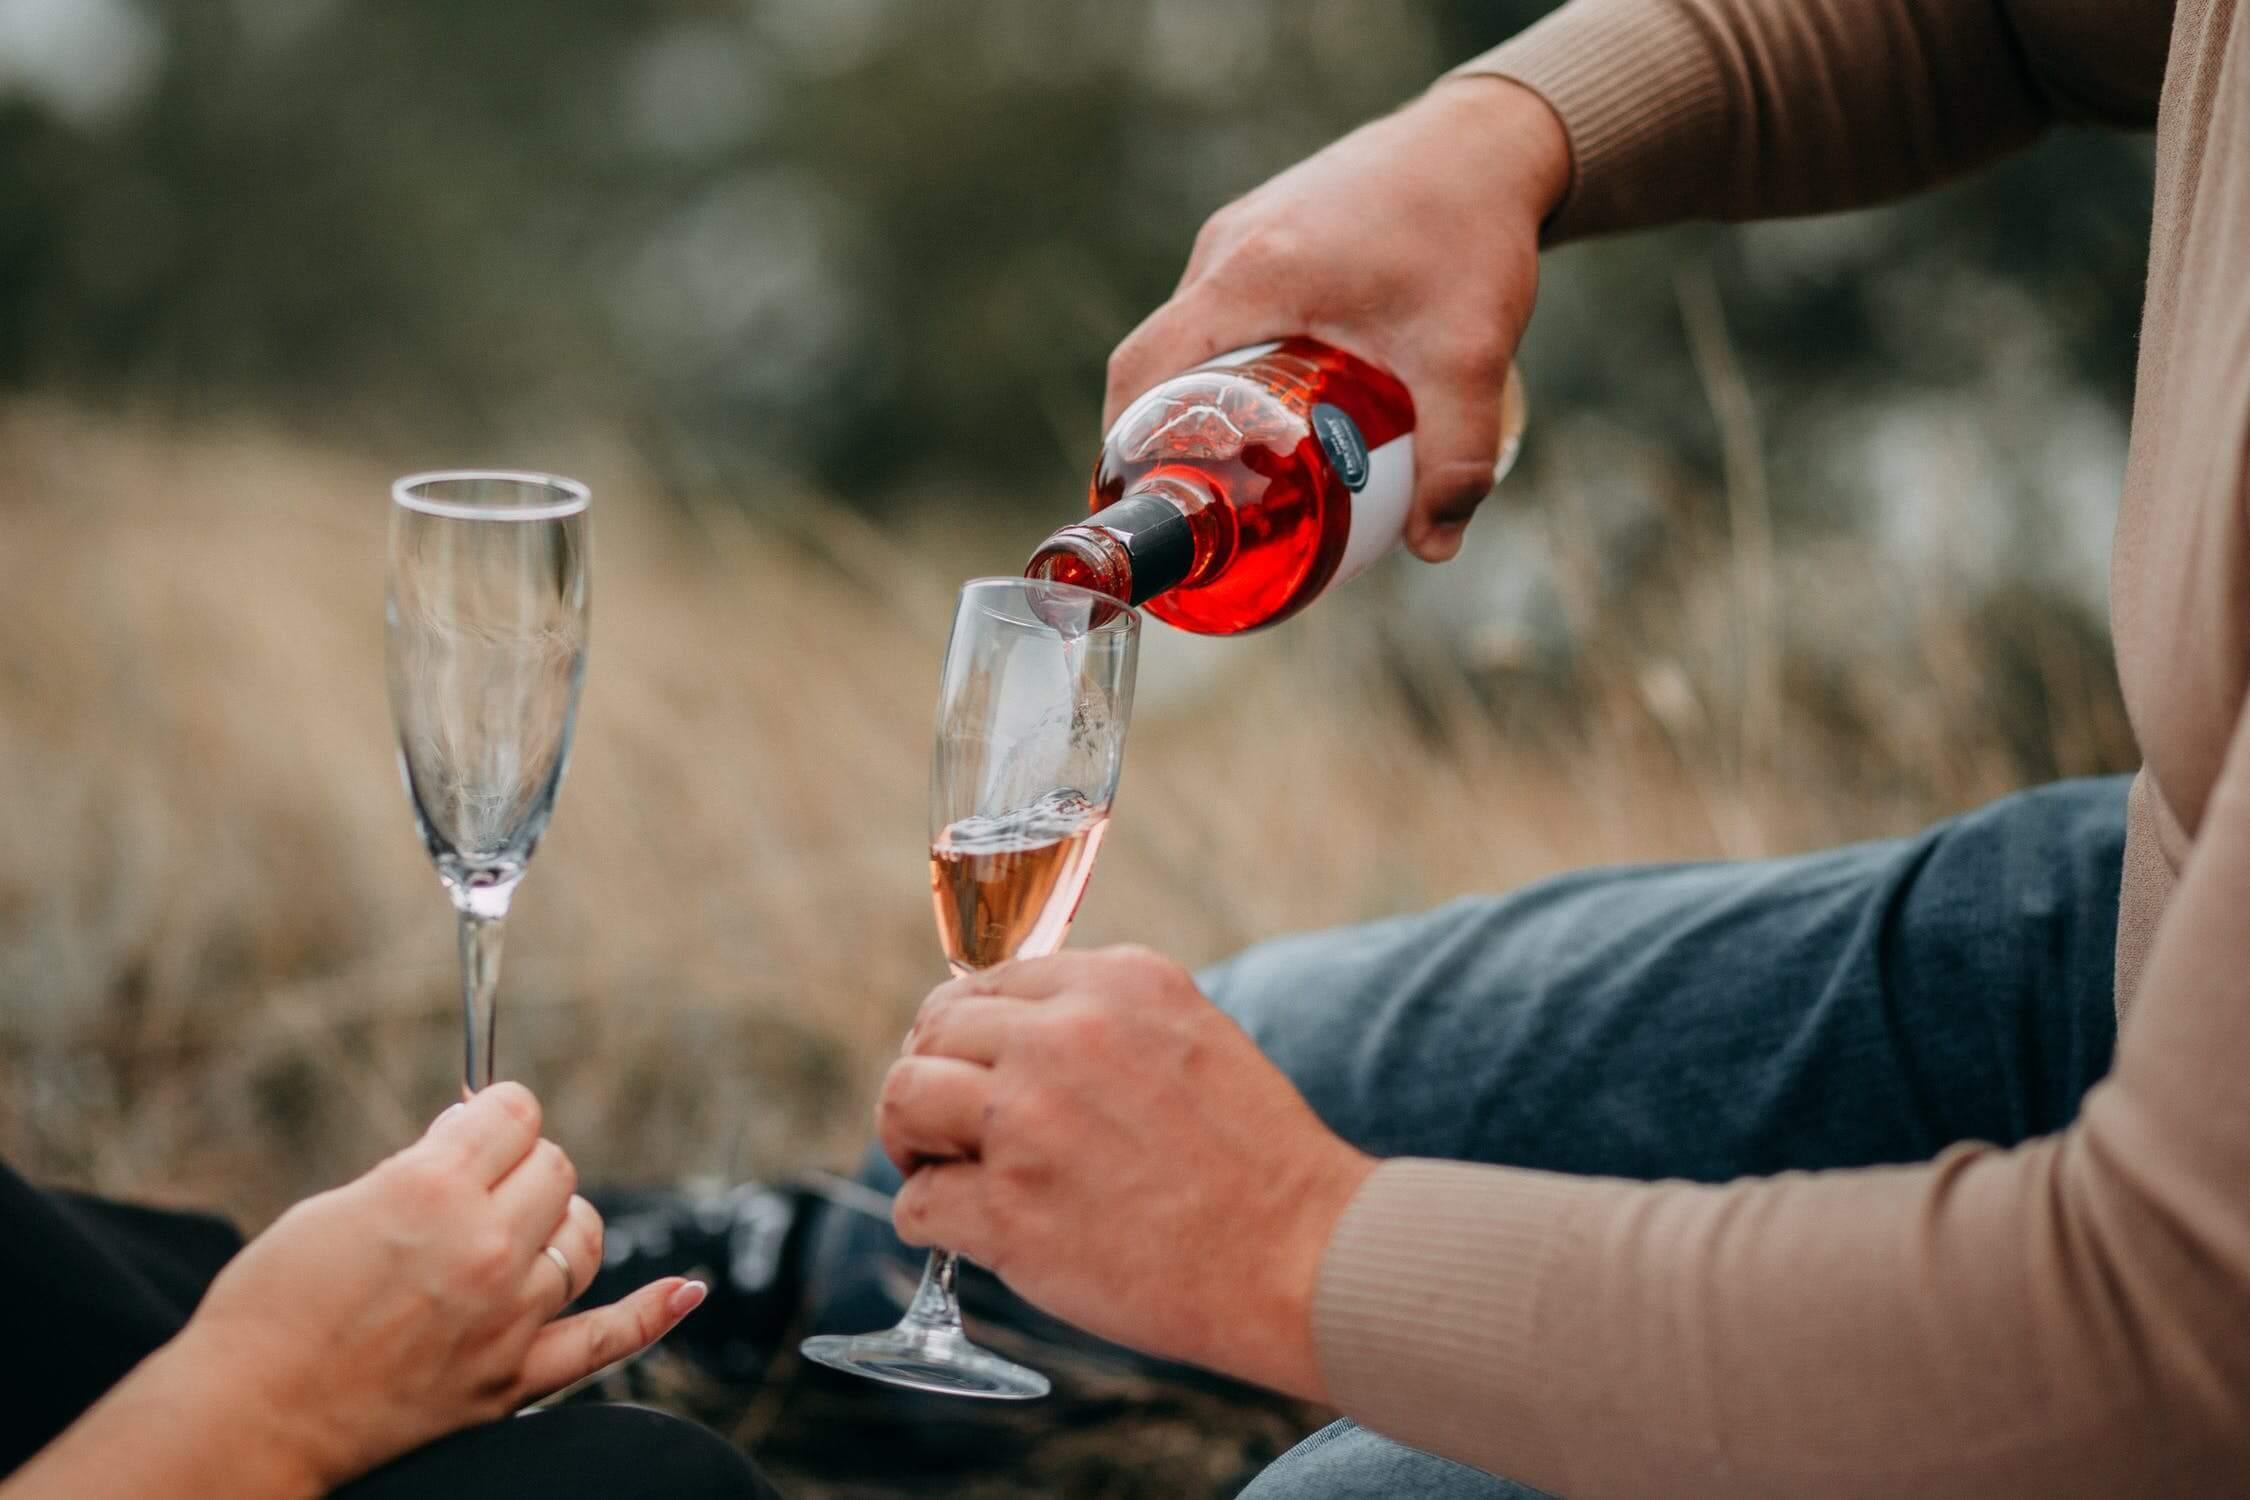 En man fyller två champagneglas med mousserande rosévin.